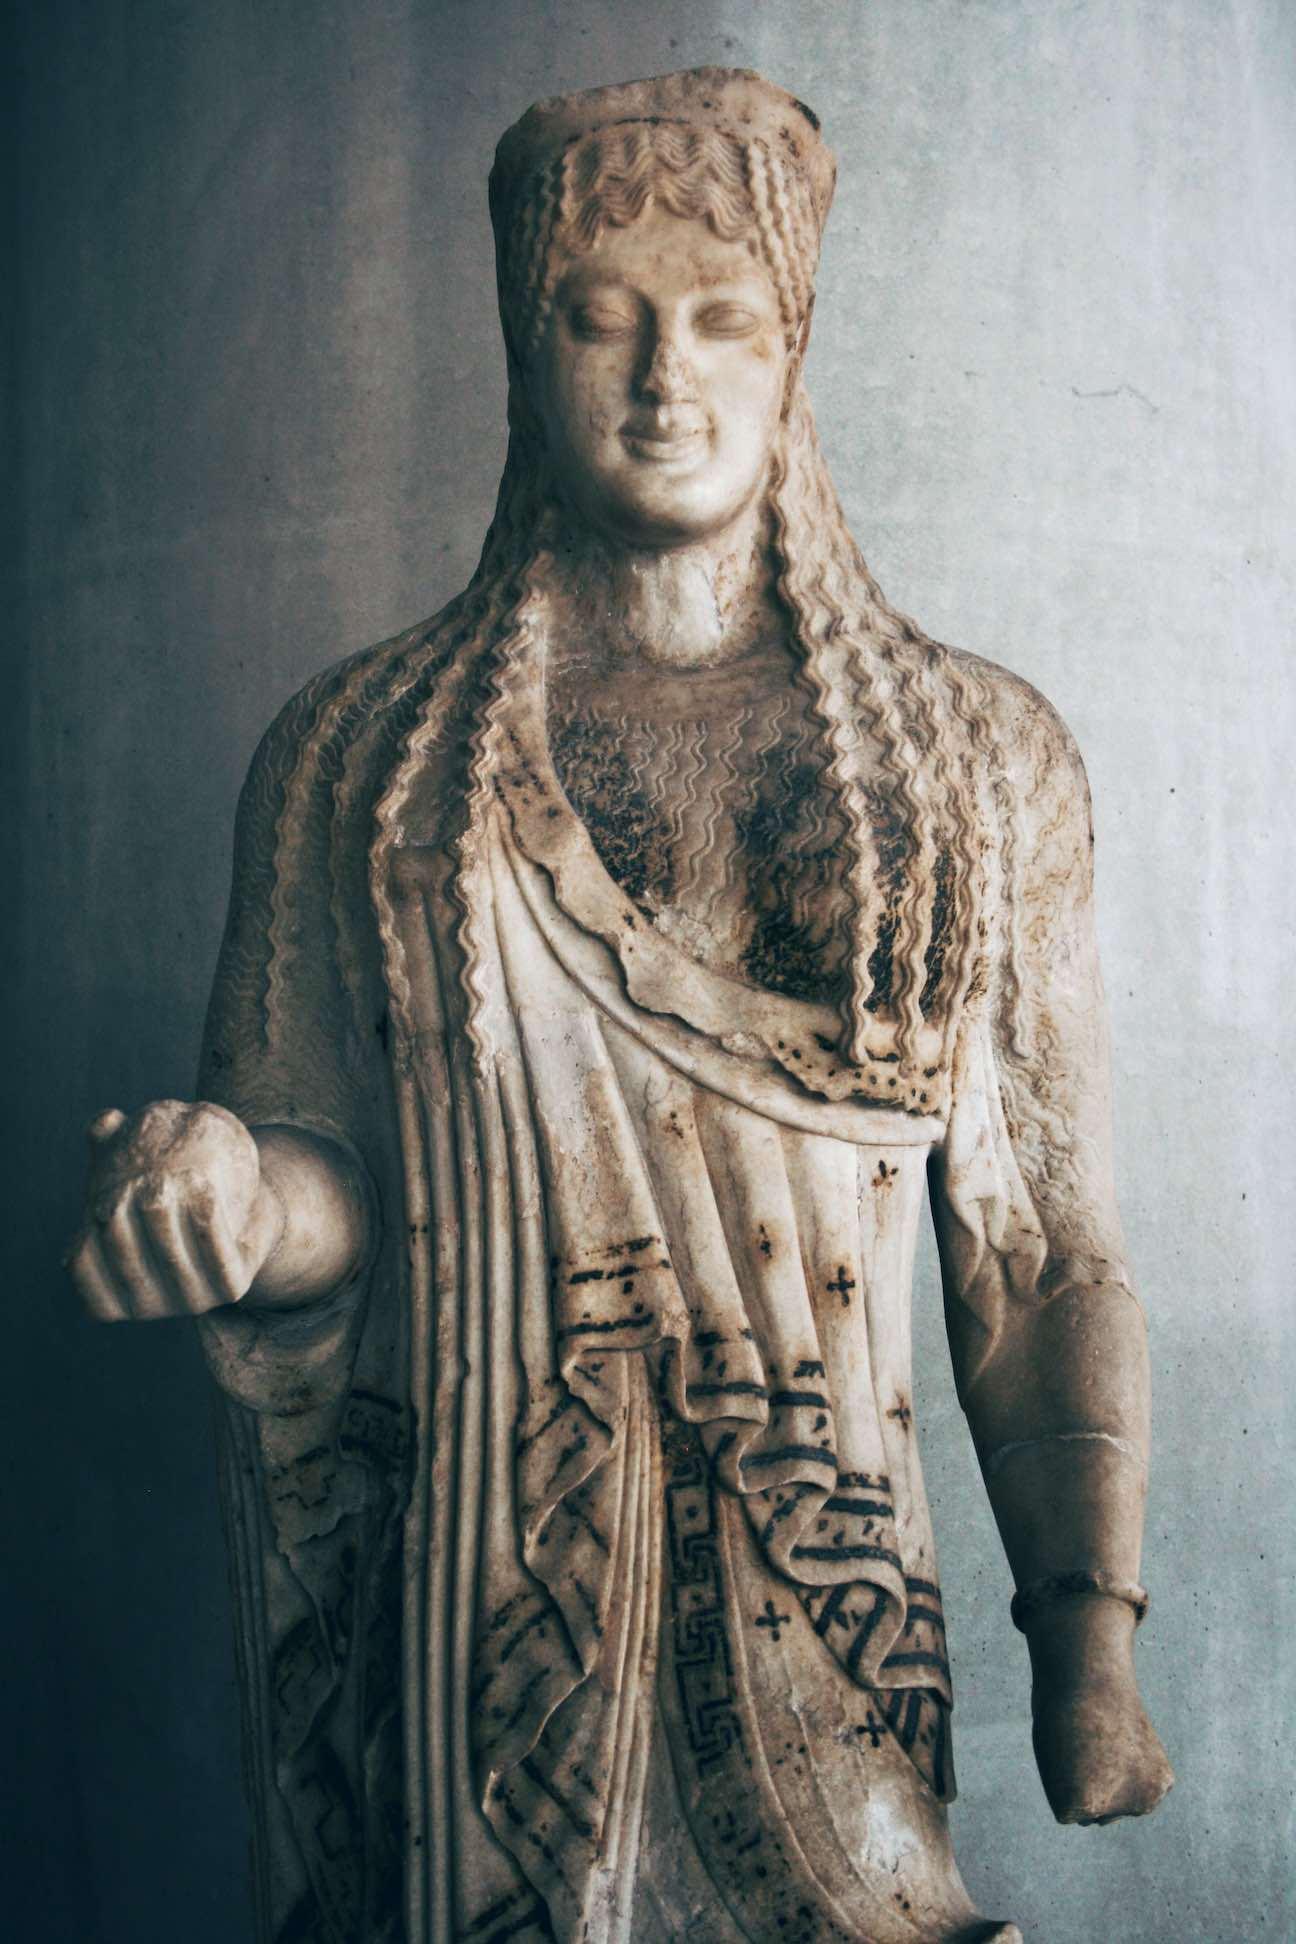 Travel Food People - Acropolis Museum, Athens